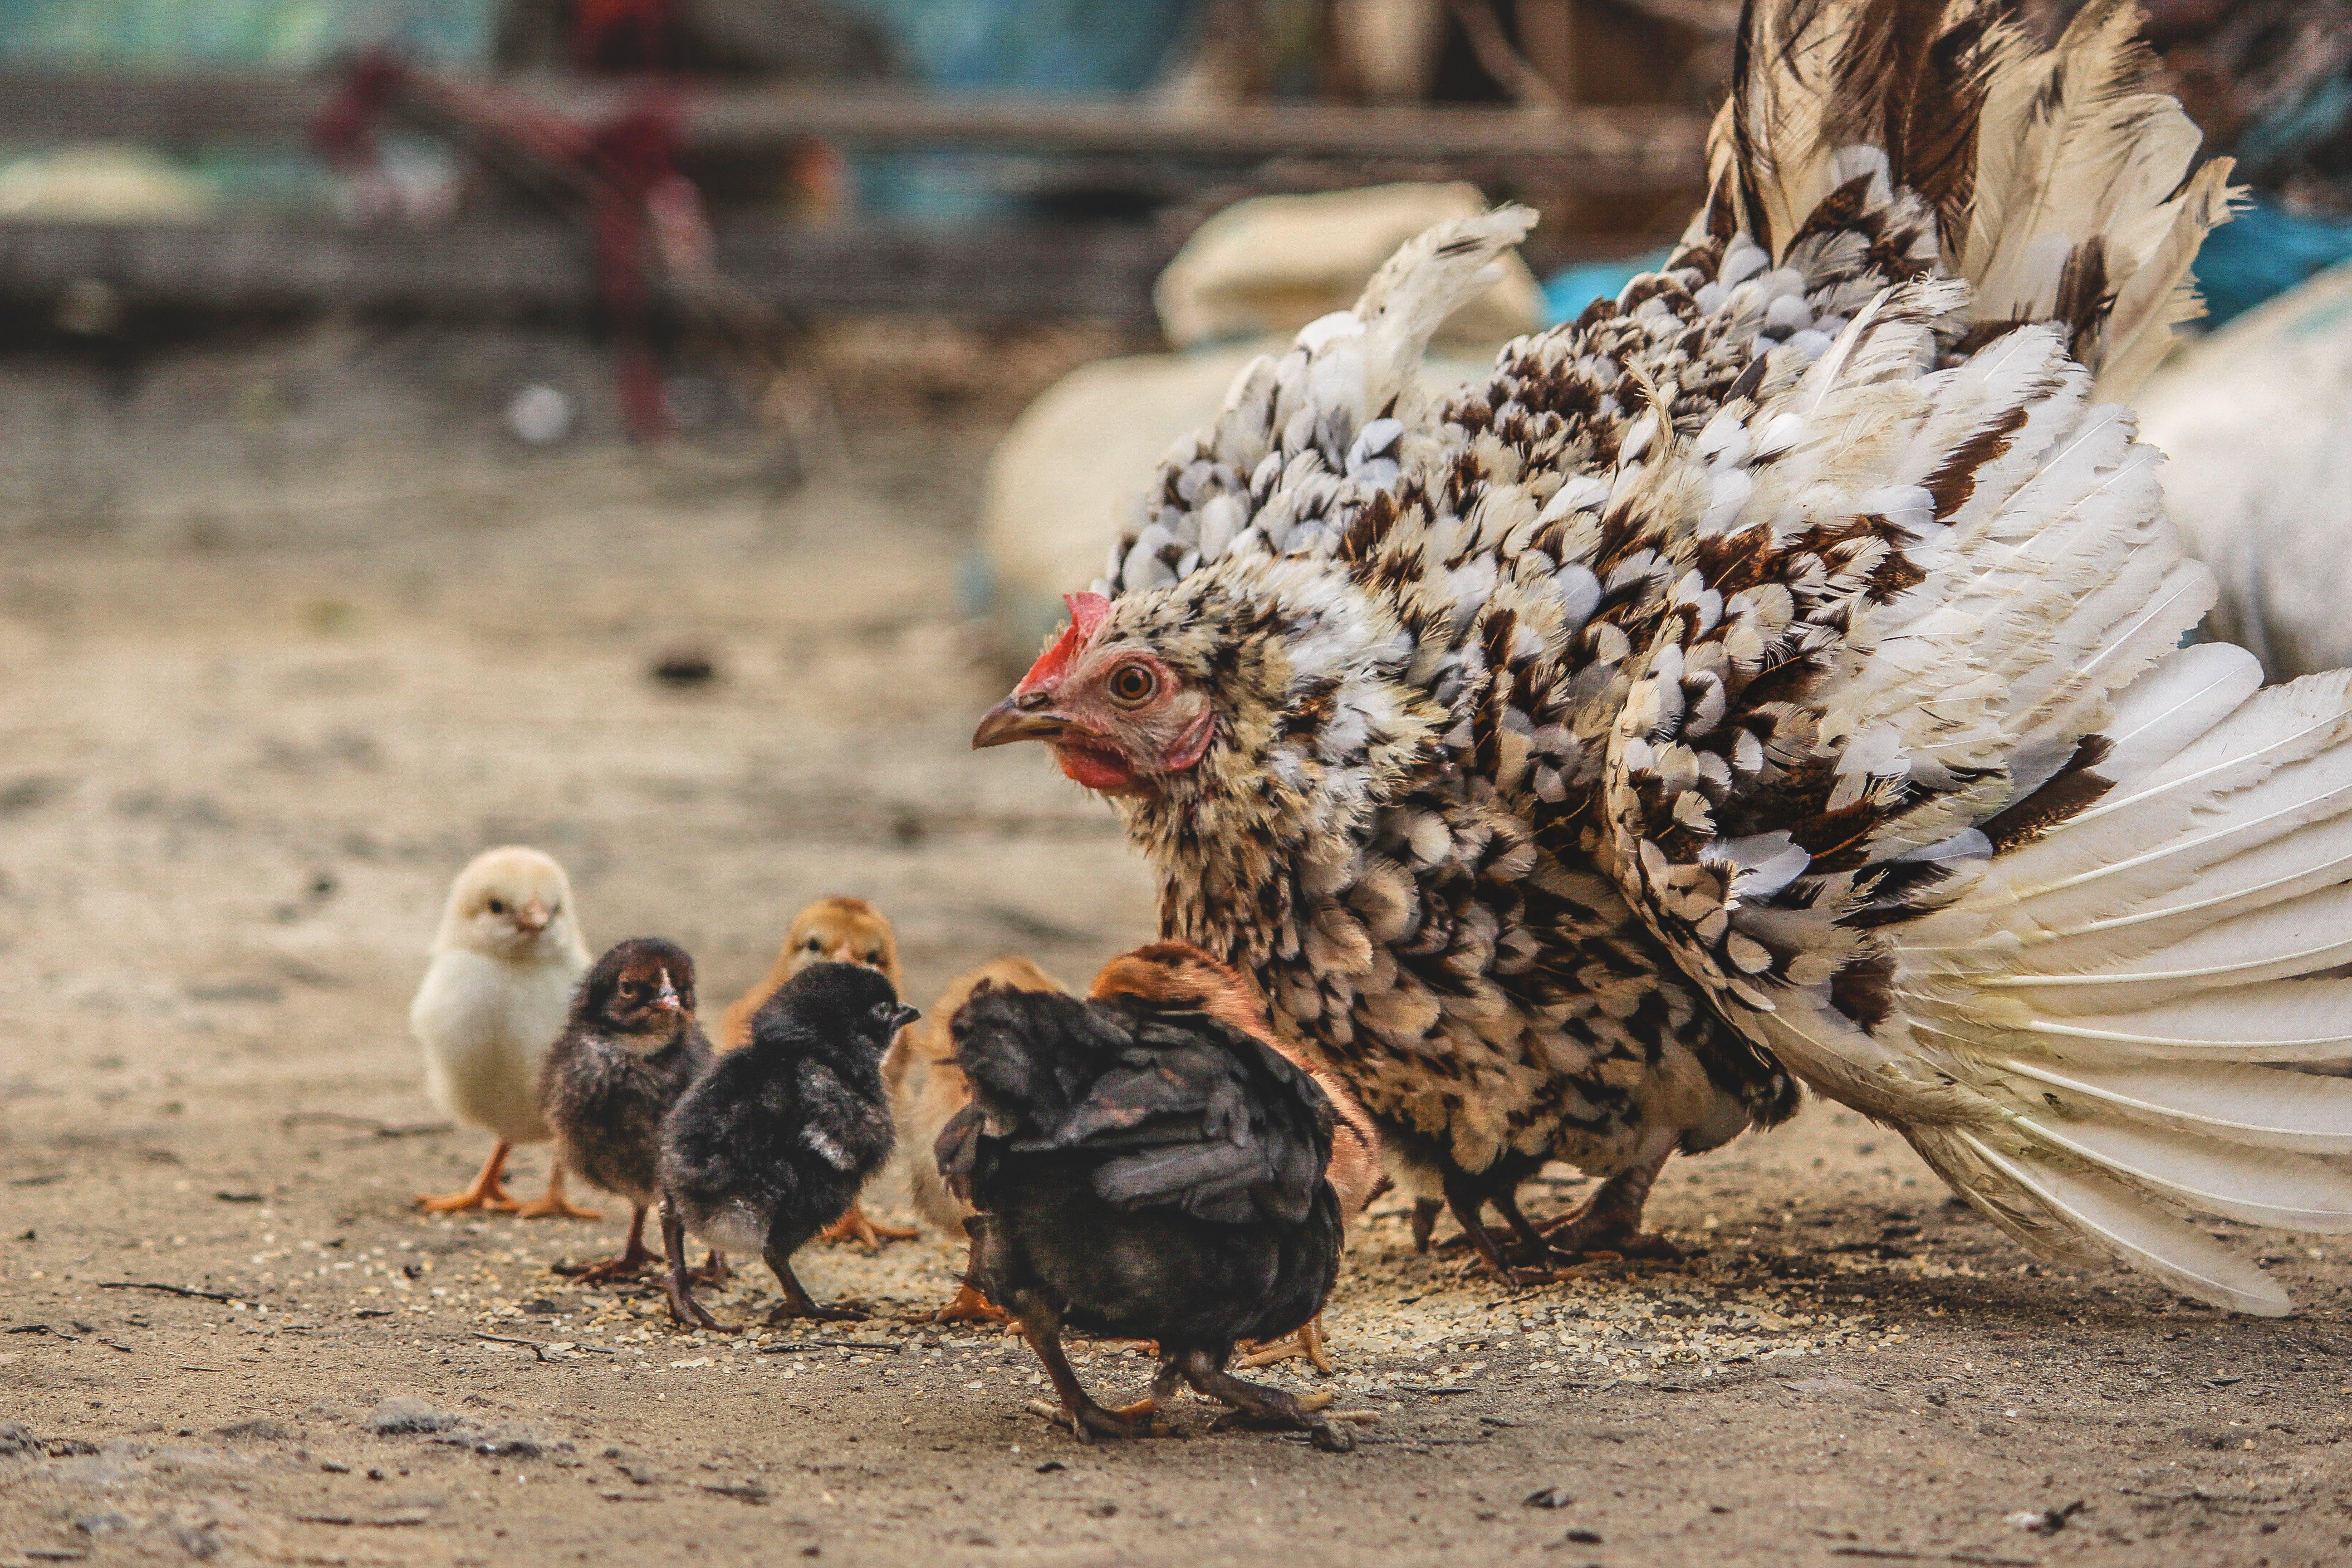 White and Black Hen Beside Chicken Chicks